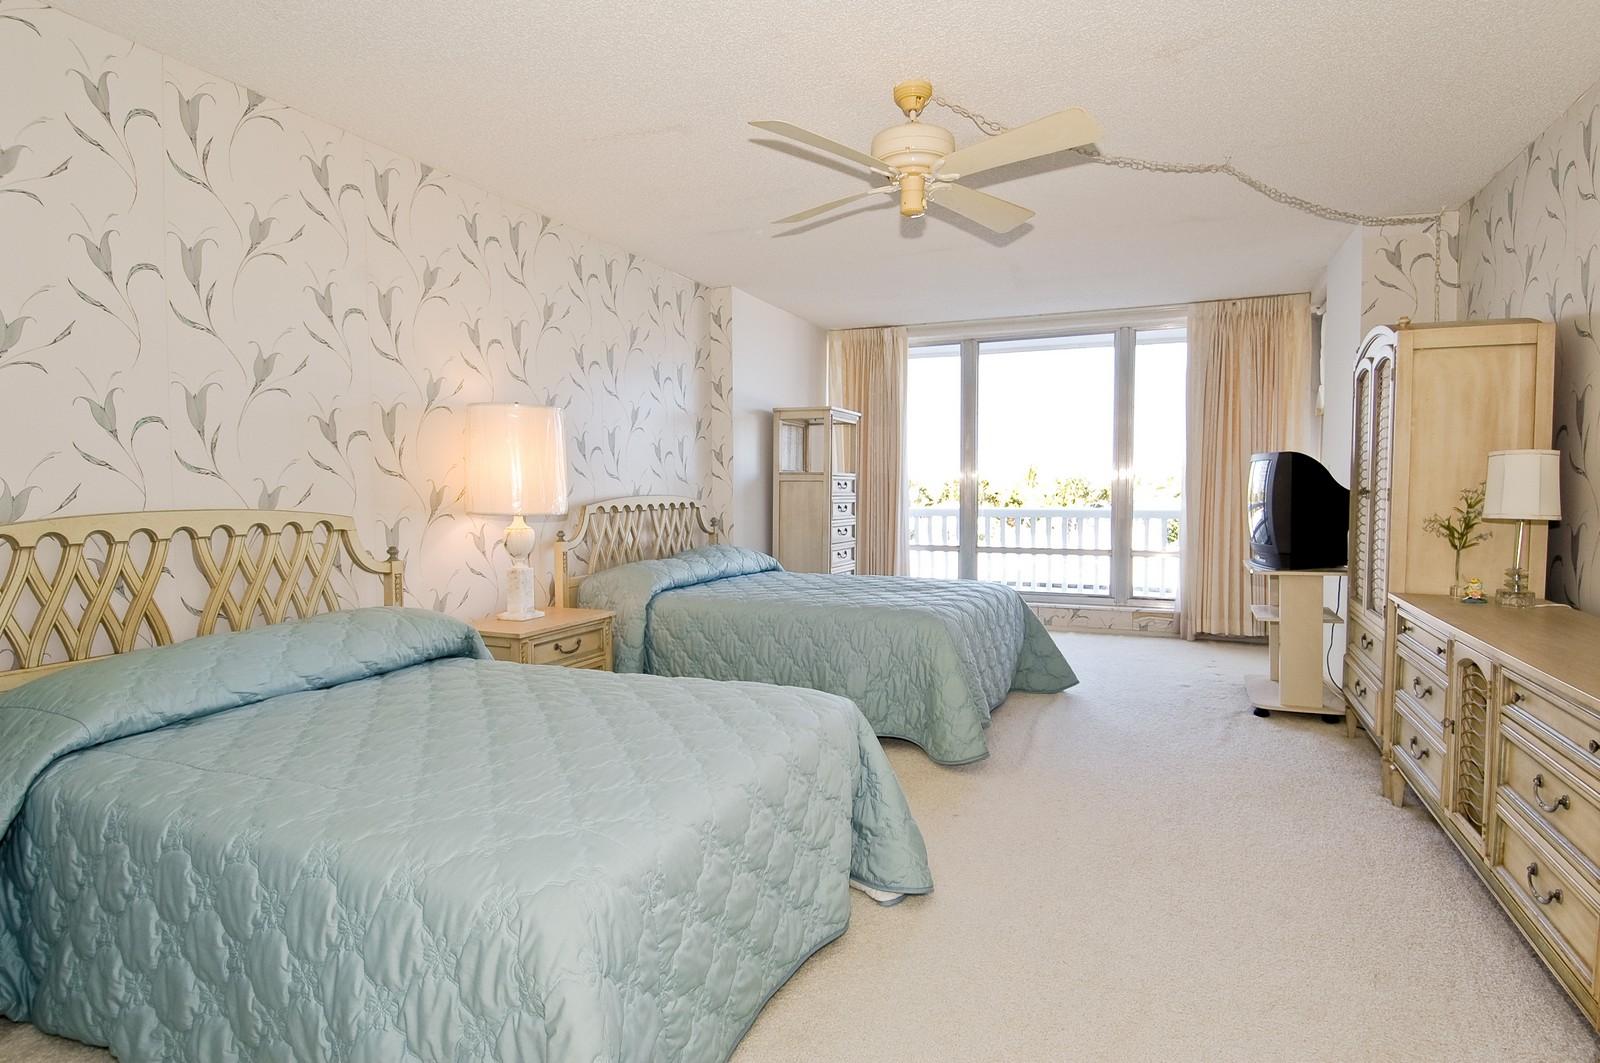 Real Estate Photography - 2200 S Ocean Ln, 206, Fort Lauderdale, FL, 33316 - Bedroom